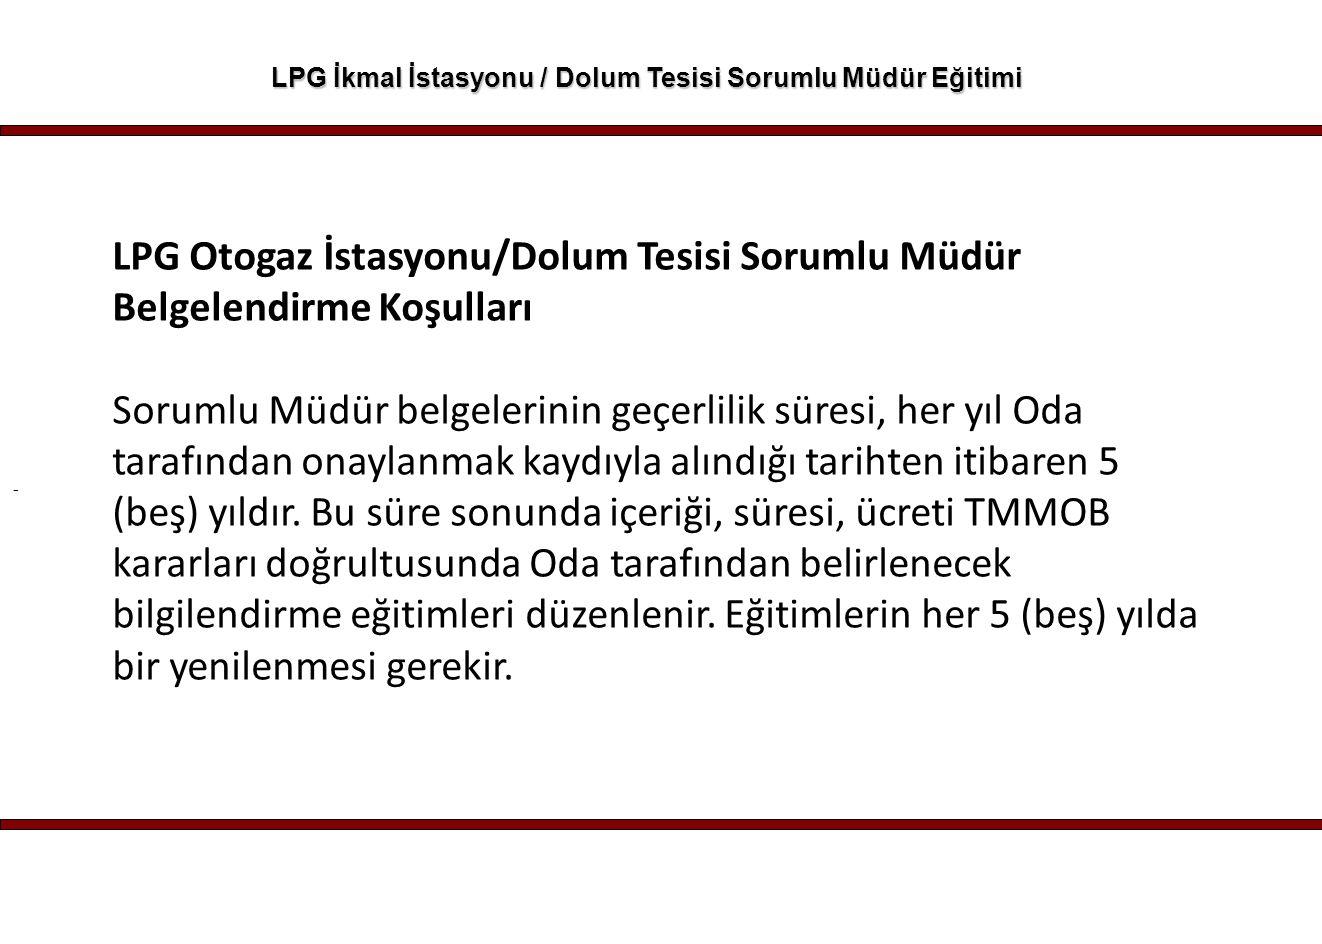 - LPG İkmal İstasyonu / Dolum Tesisi Sorumlu Müdür Eğitimi LPG Otogaz İstasyonu/Dolum Tesisi Sorumlu Müdür Belgelendirme Koşulları Sorumlu Müdür belge